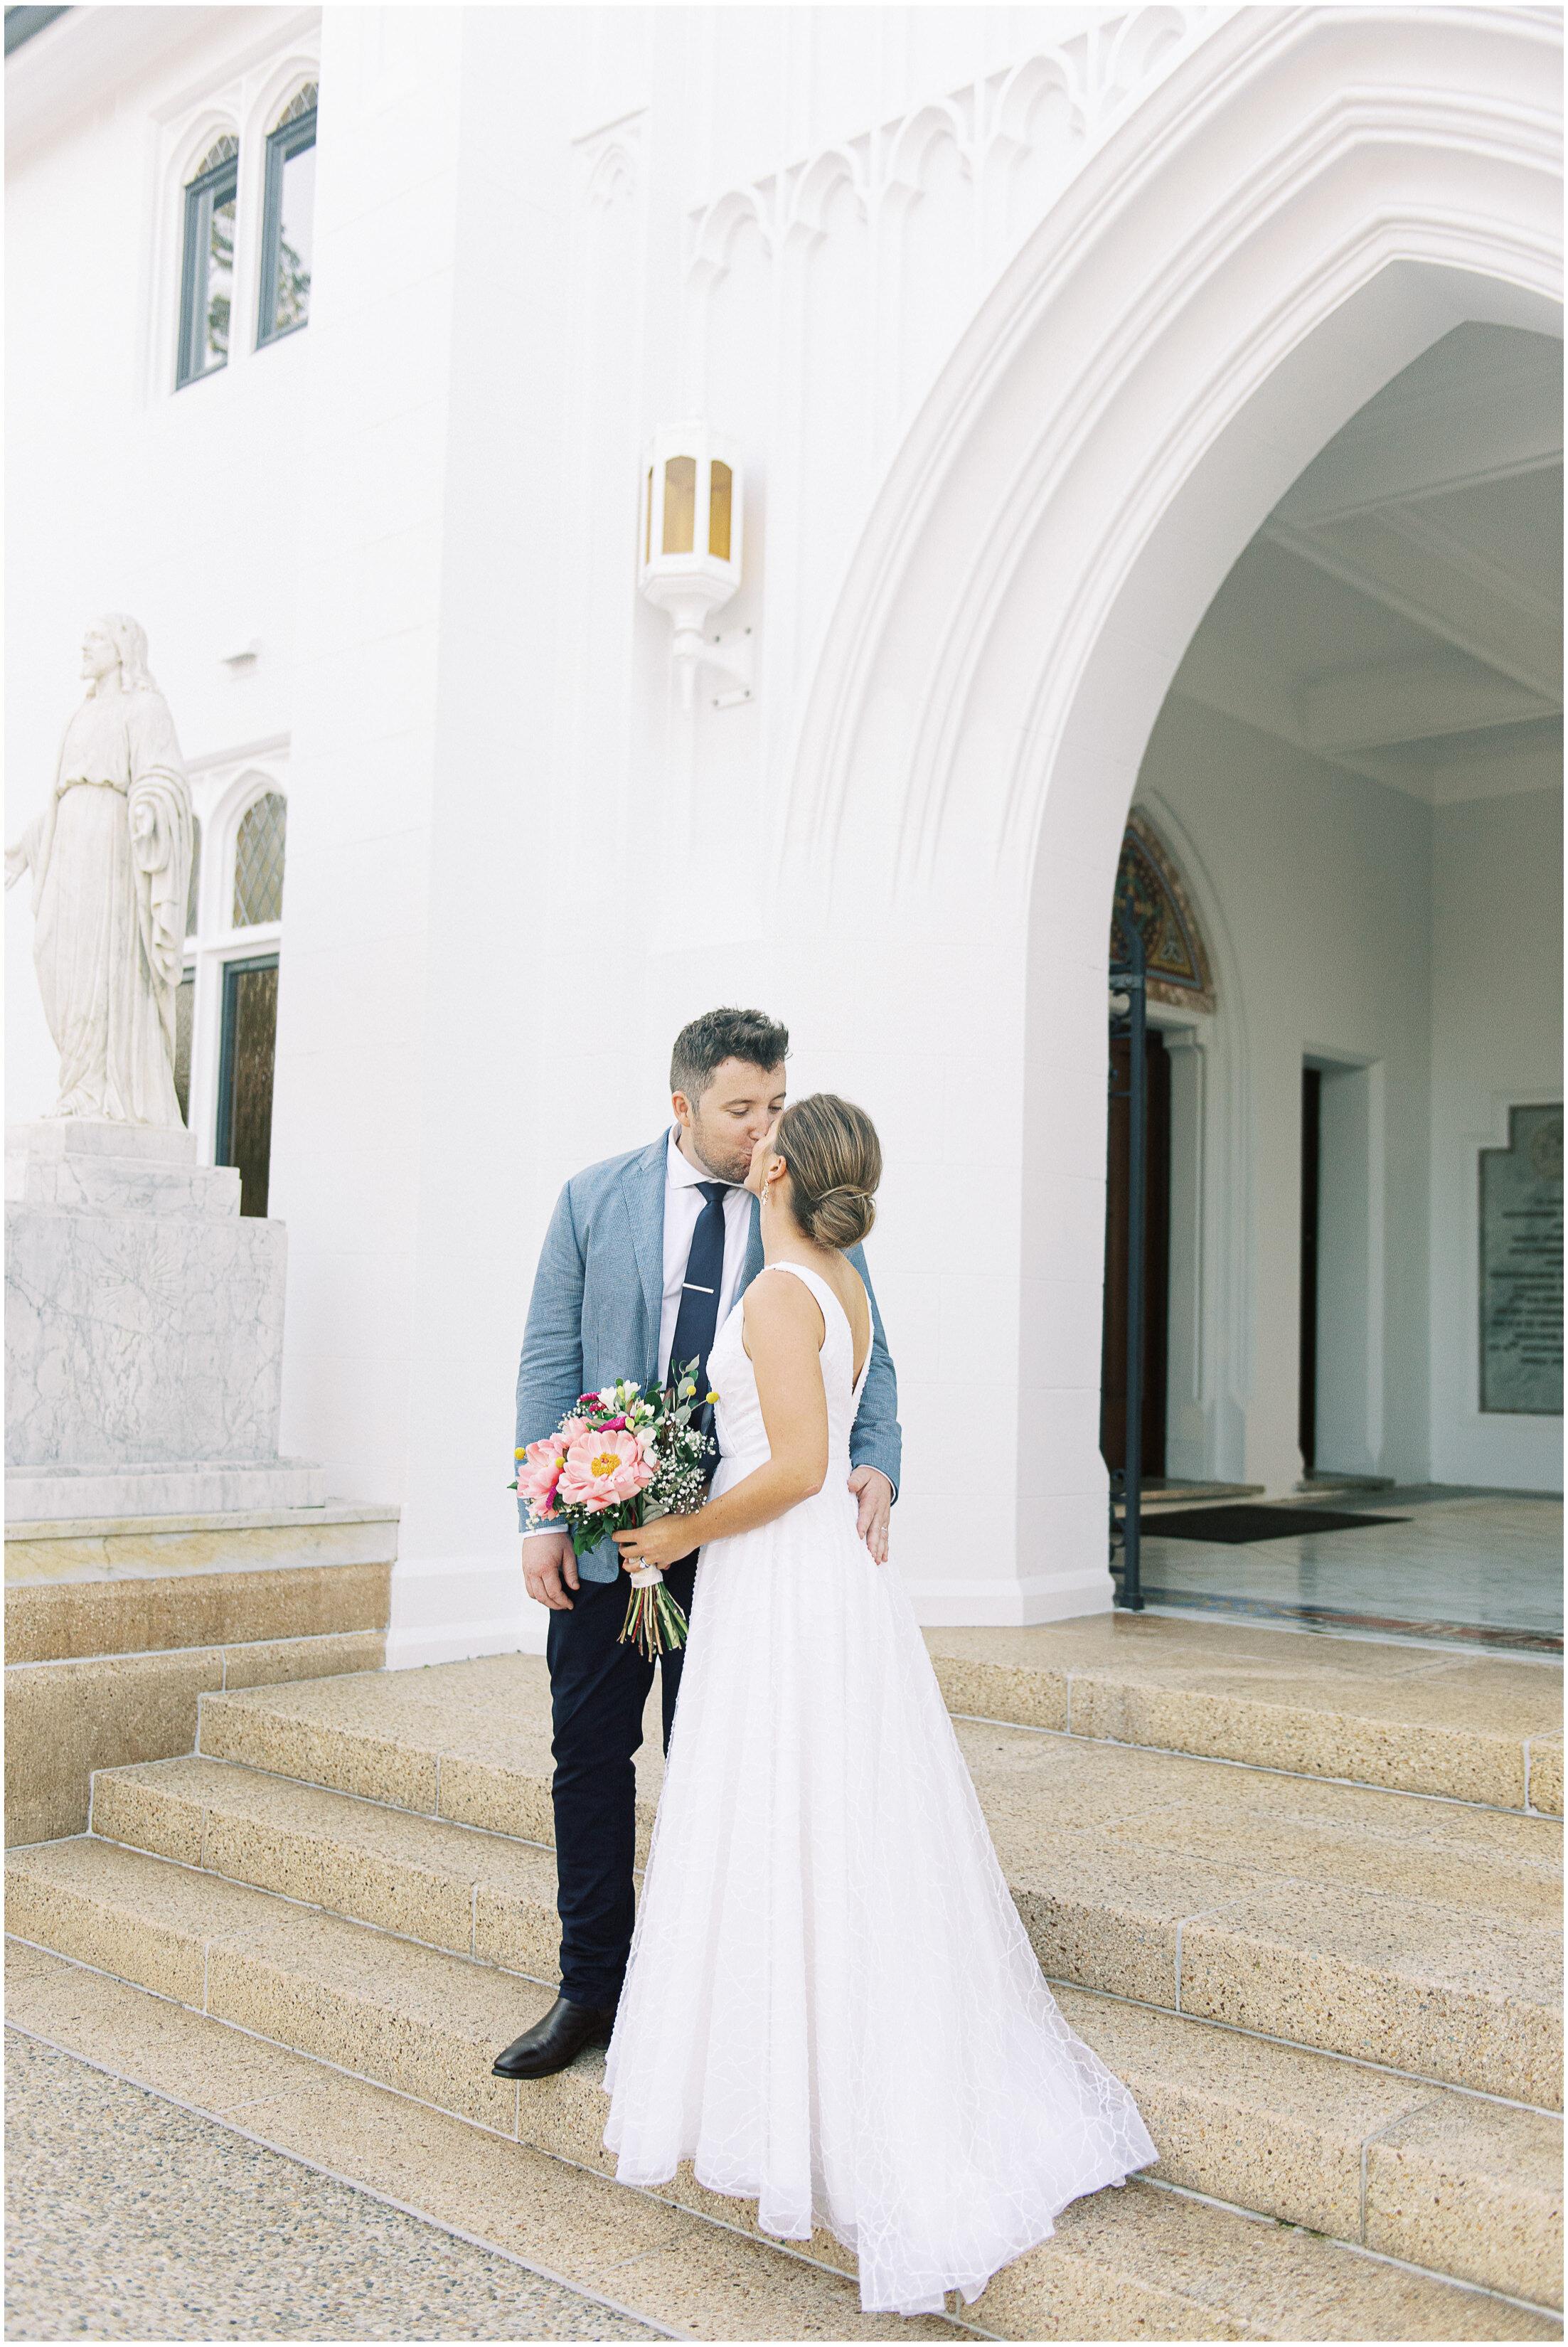 refinery-brisbane-wedding-photography-film-photographer-fine-art-25.jpg